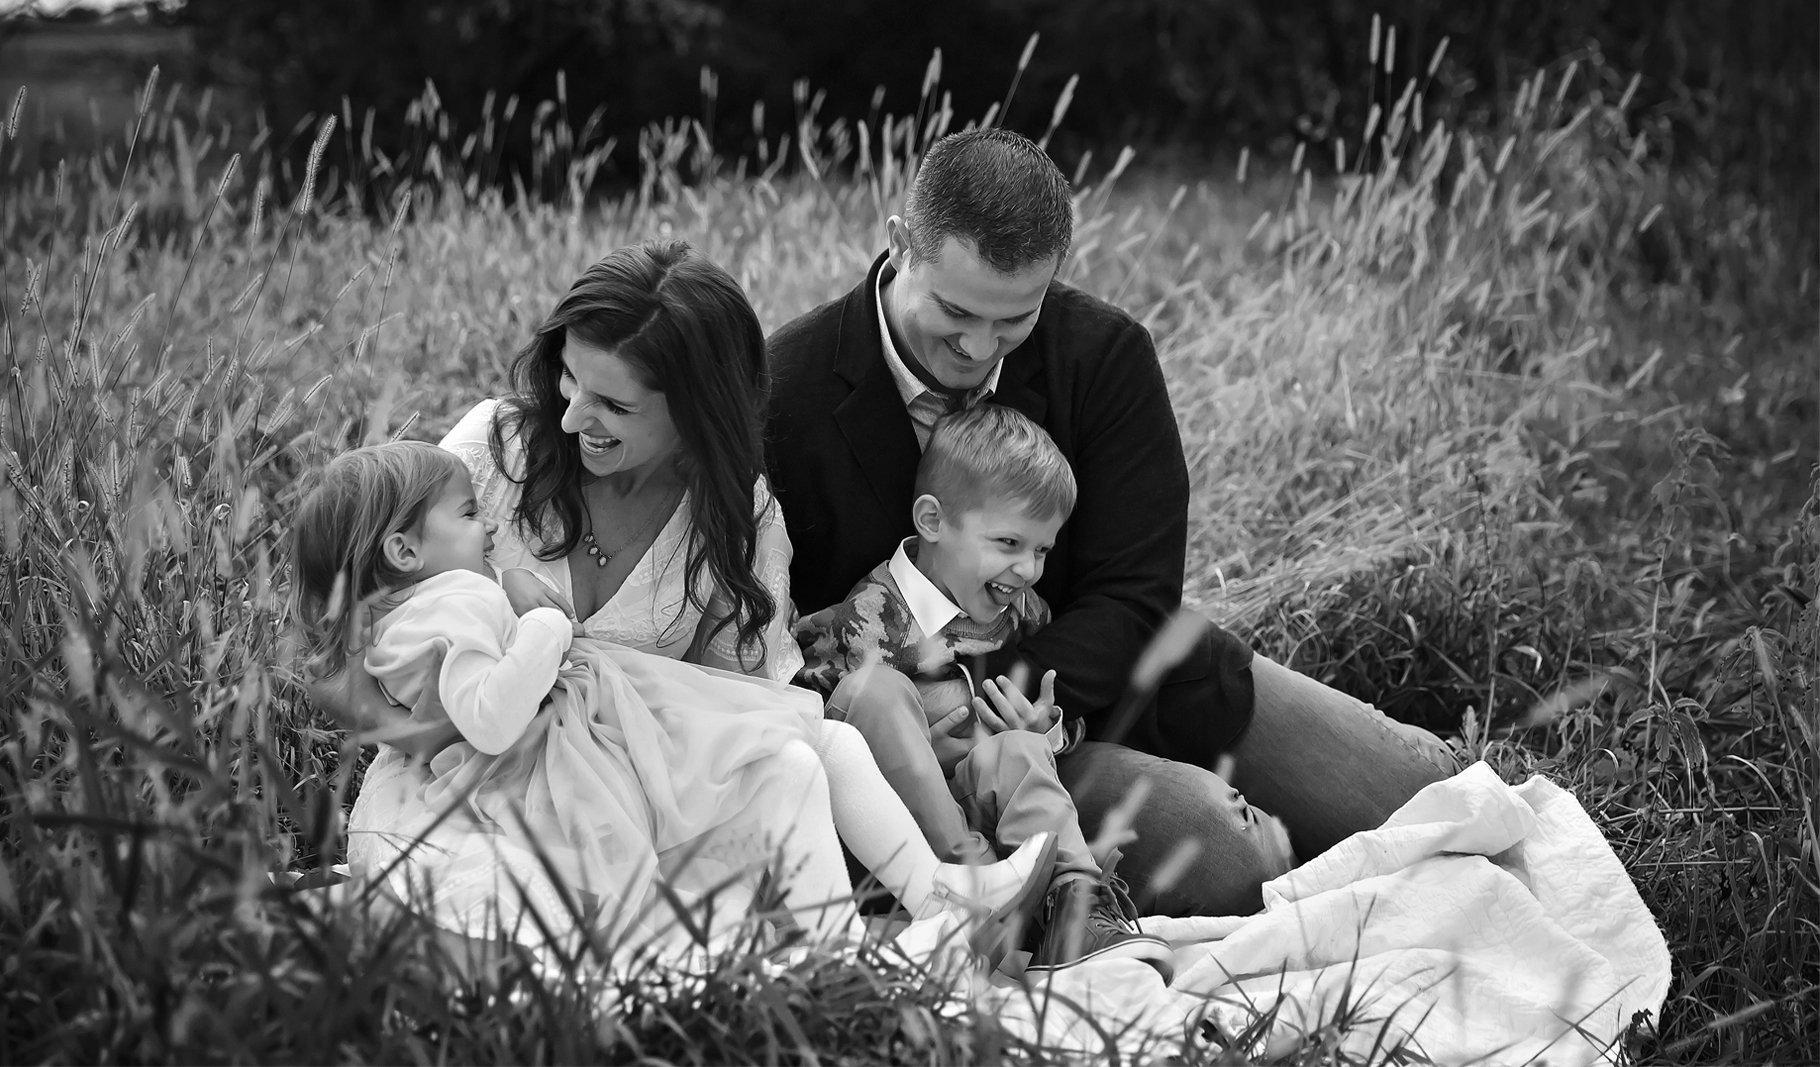 Families, Sycamore, St Charles, Geneva IL Newborn and Family Photographer, Newborn Photographer, Baby Photographer, Photographer near me